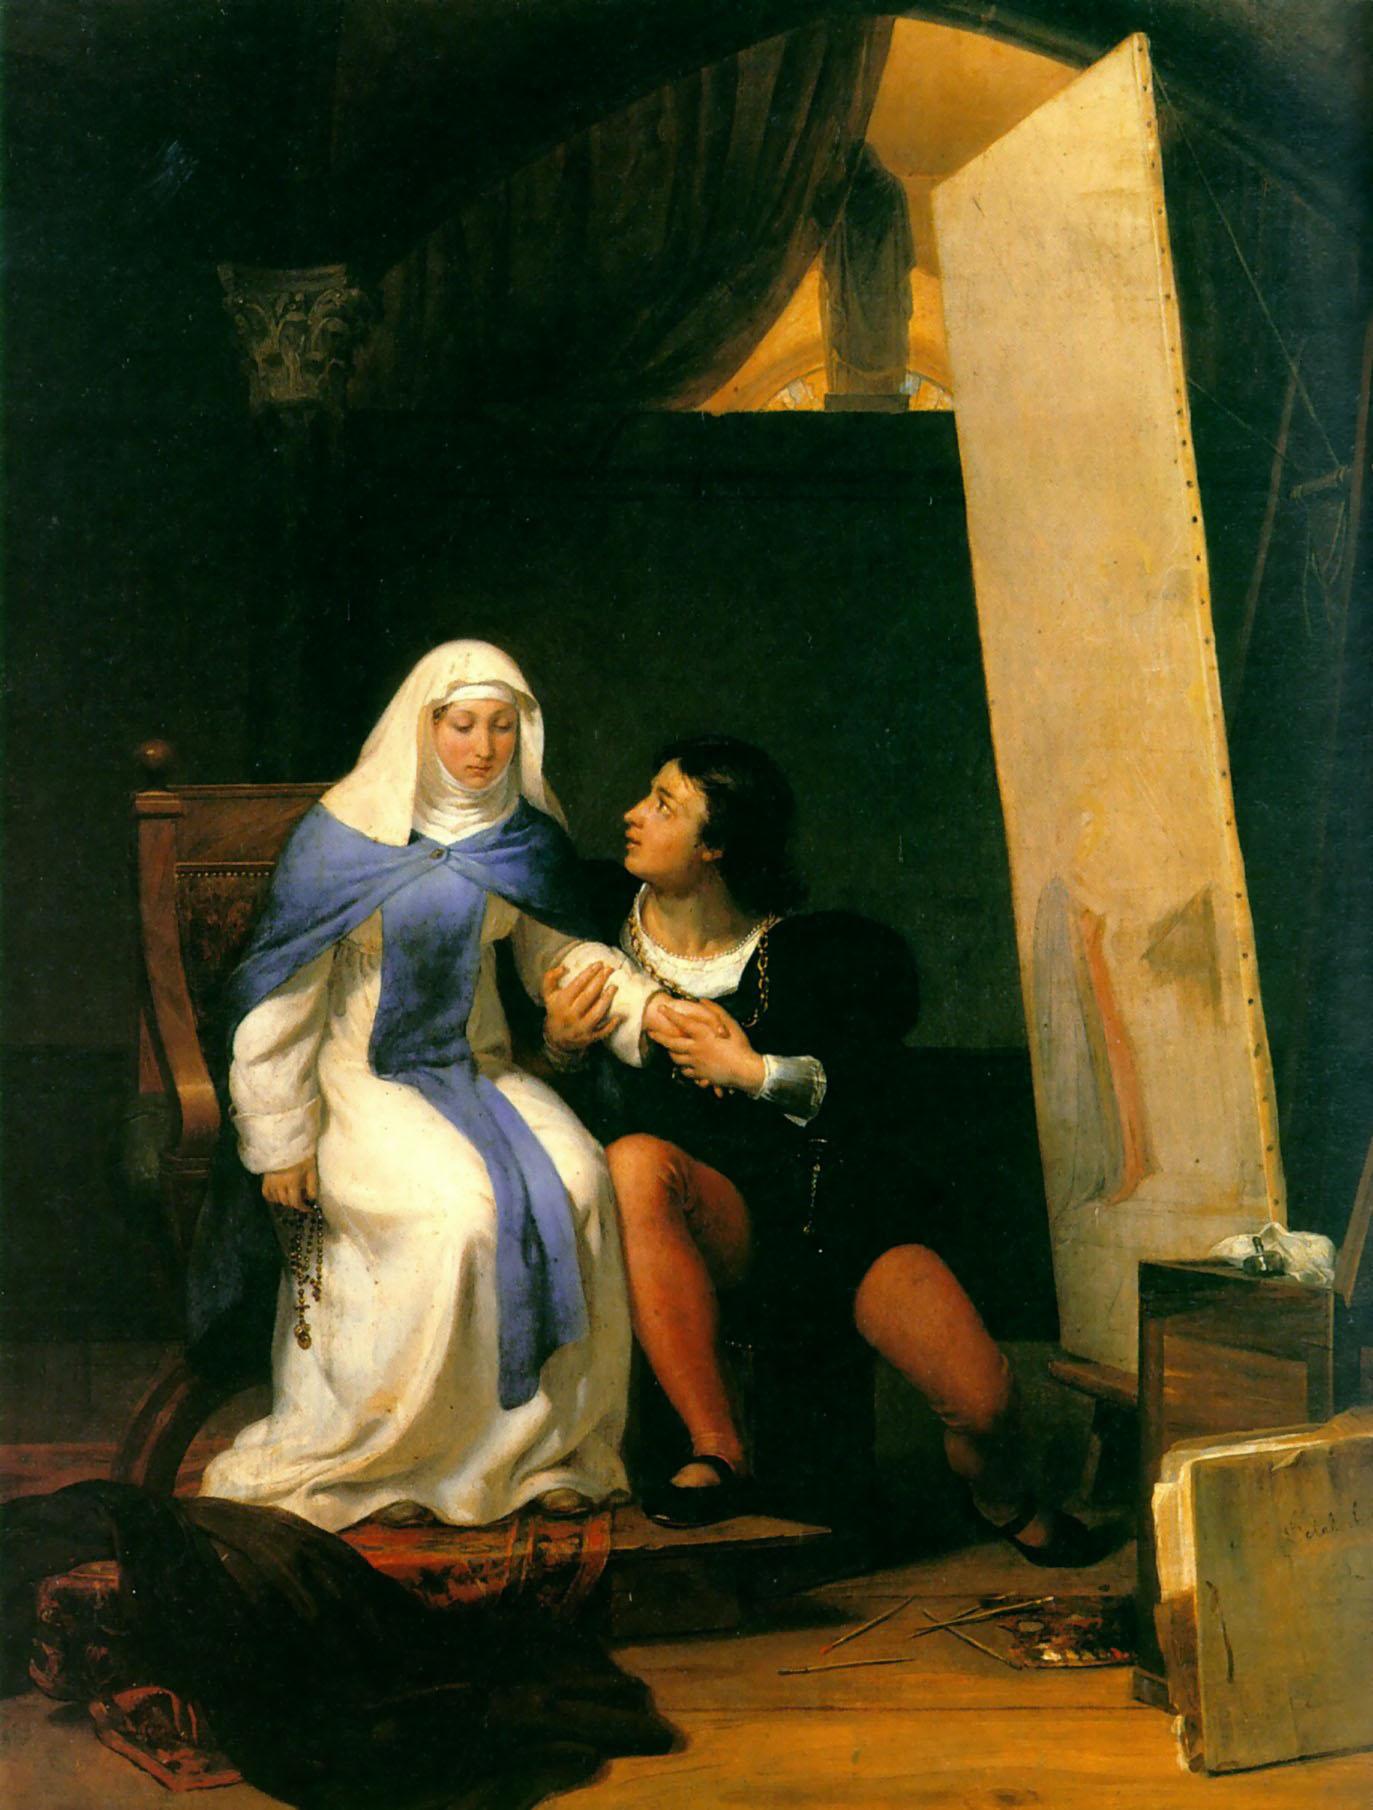 Fra Filippo Lippi Falling in Love with his Model :: Paul Delaroche - Romantic scenes in art and painting ôîòî